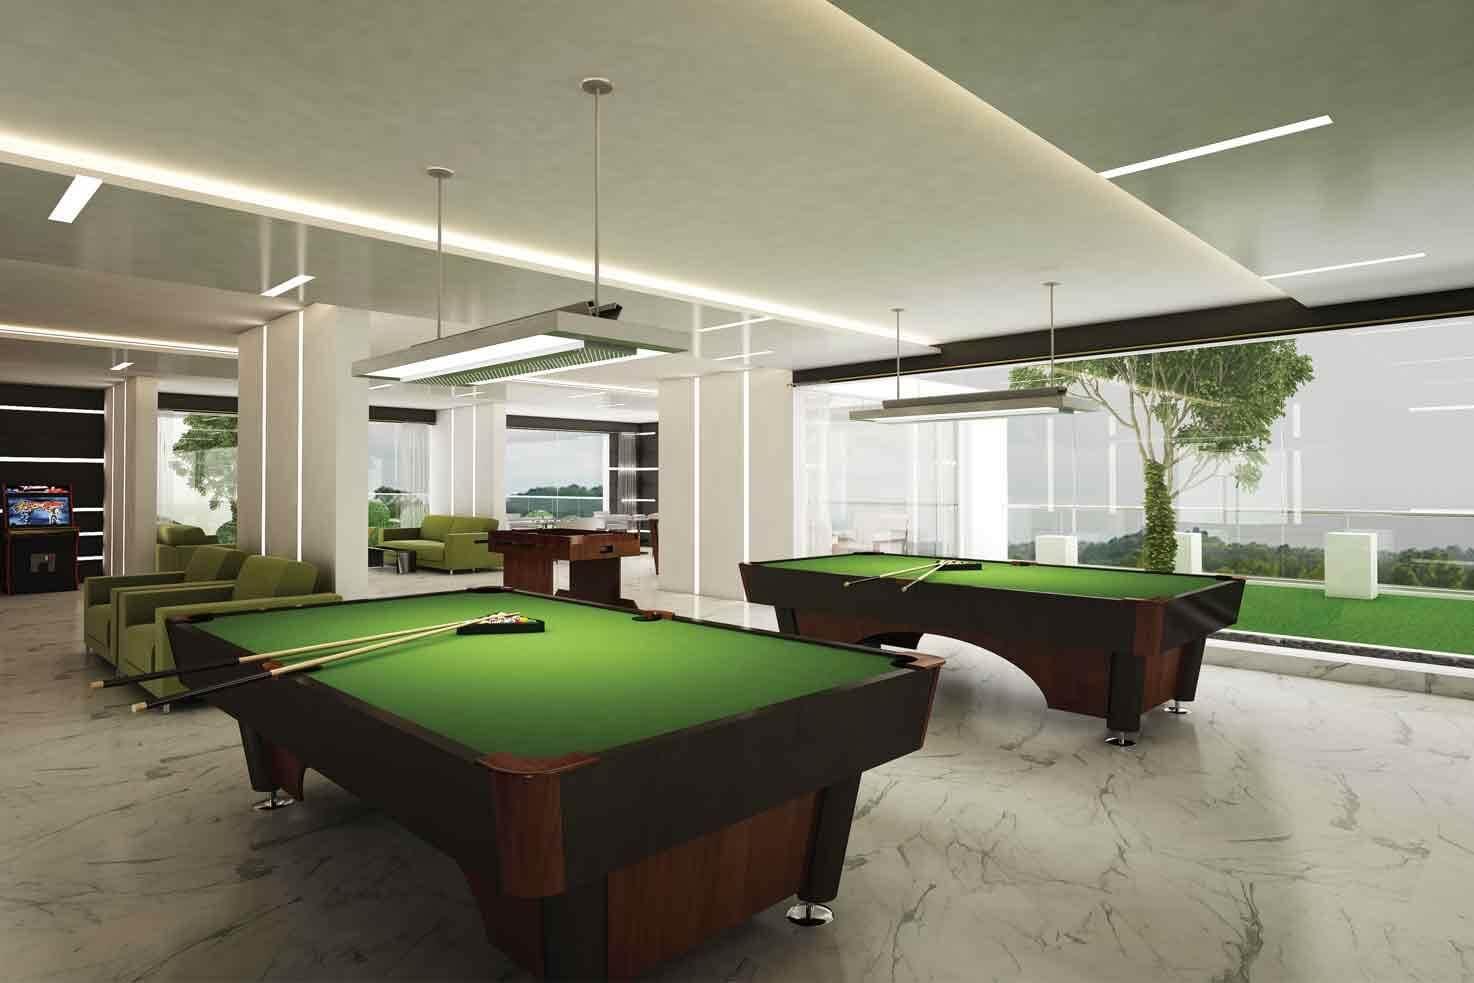 ps panache amenities features2